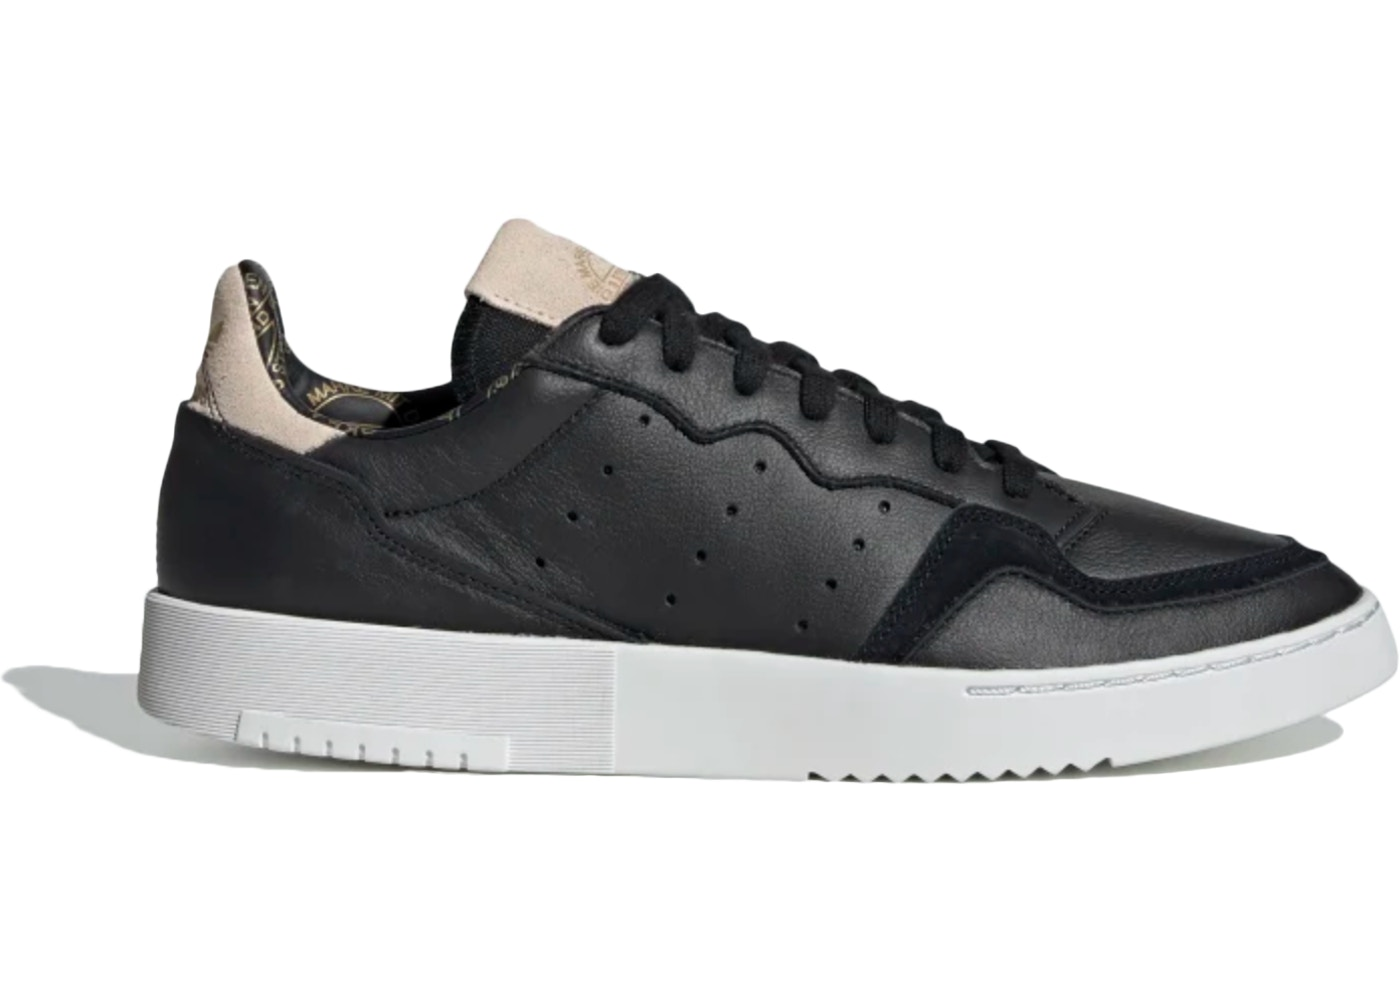 adidas Originals Adidas Supercourt Rx W St Pale Nude/ St